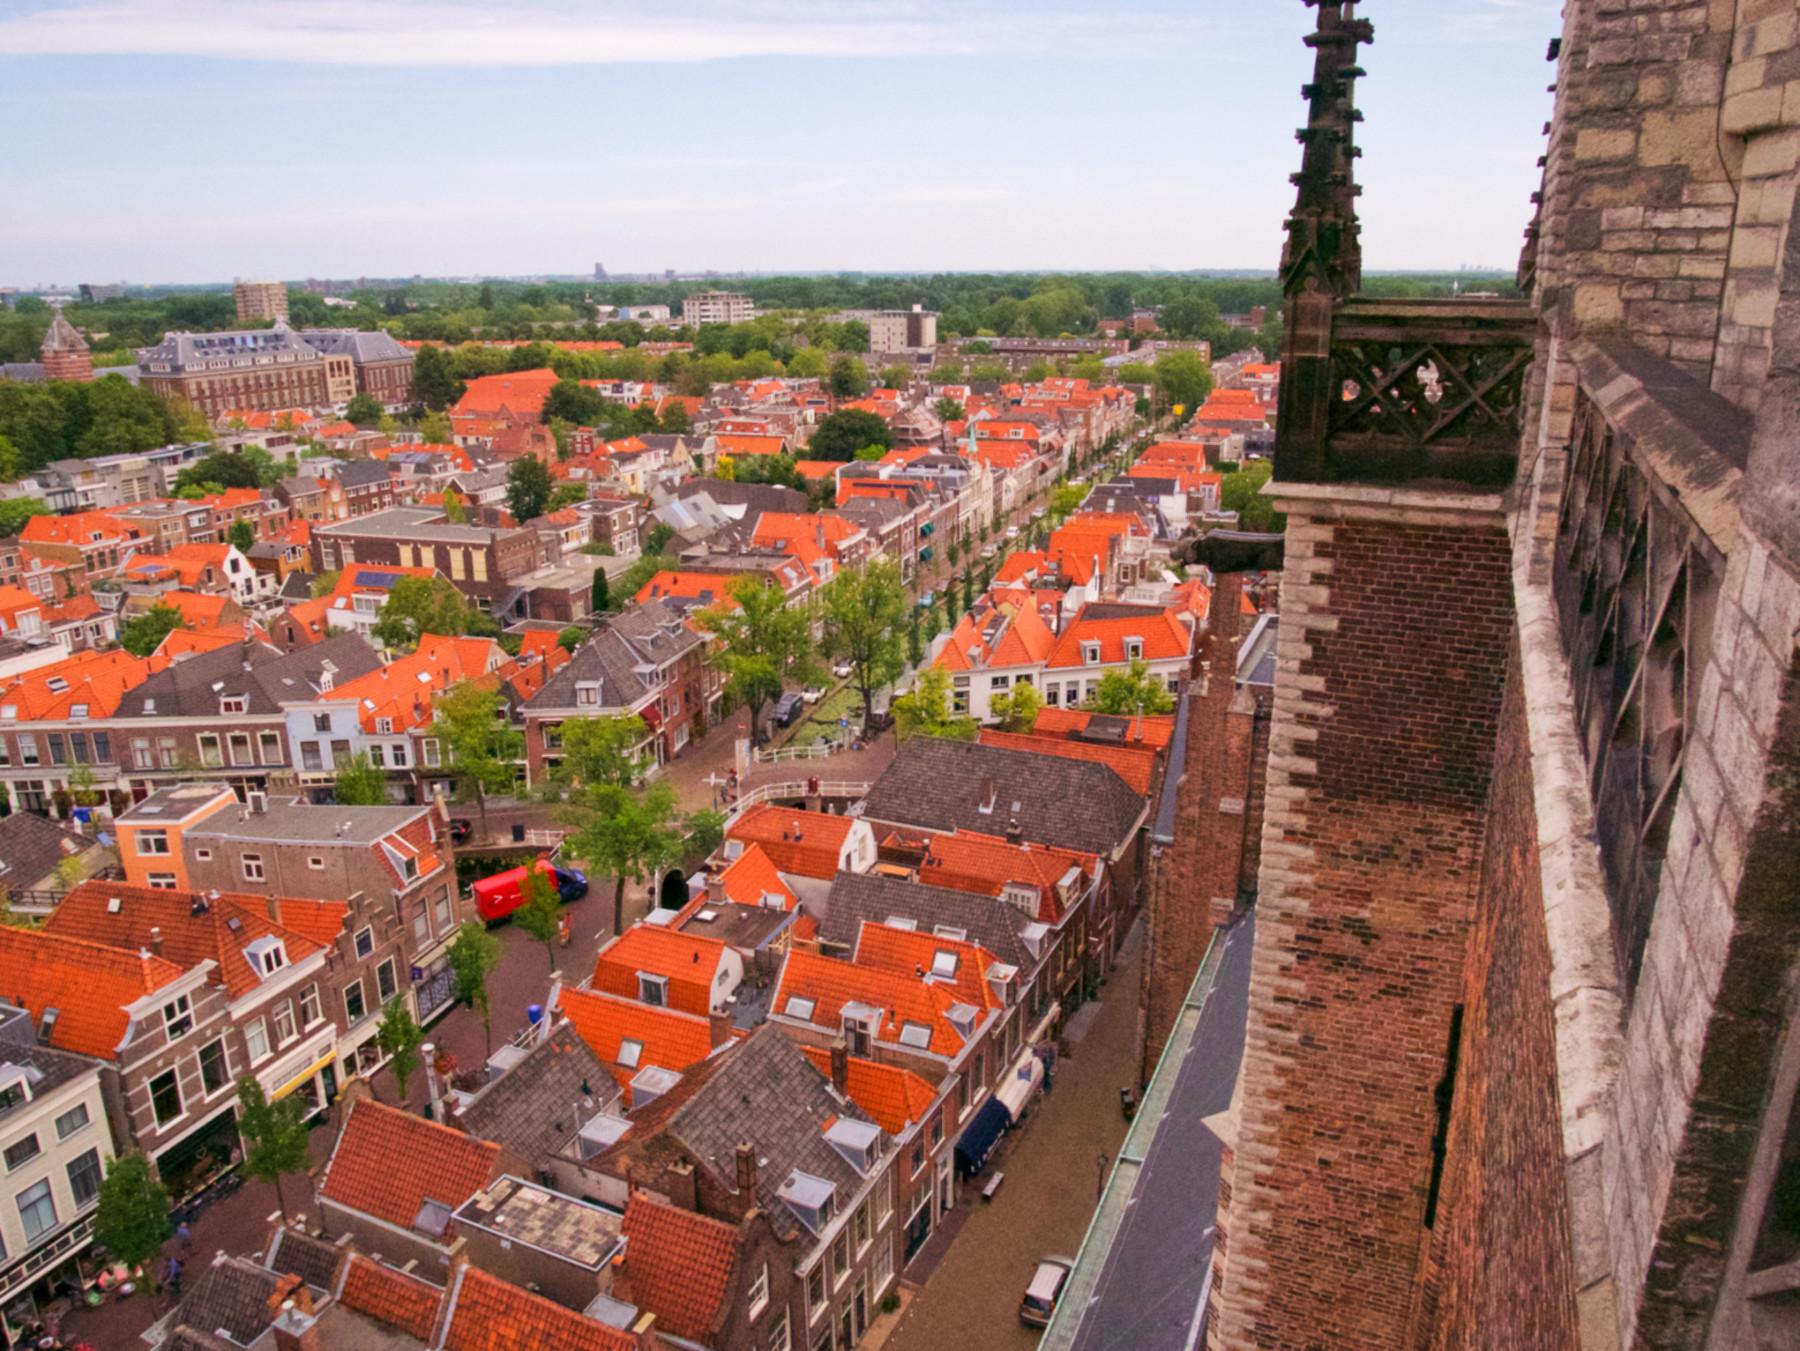 049-Nederland-Delft